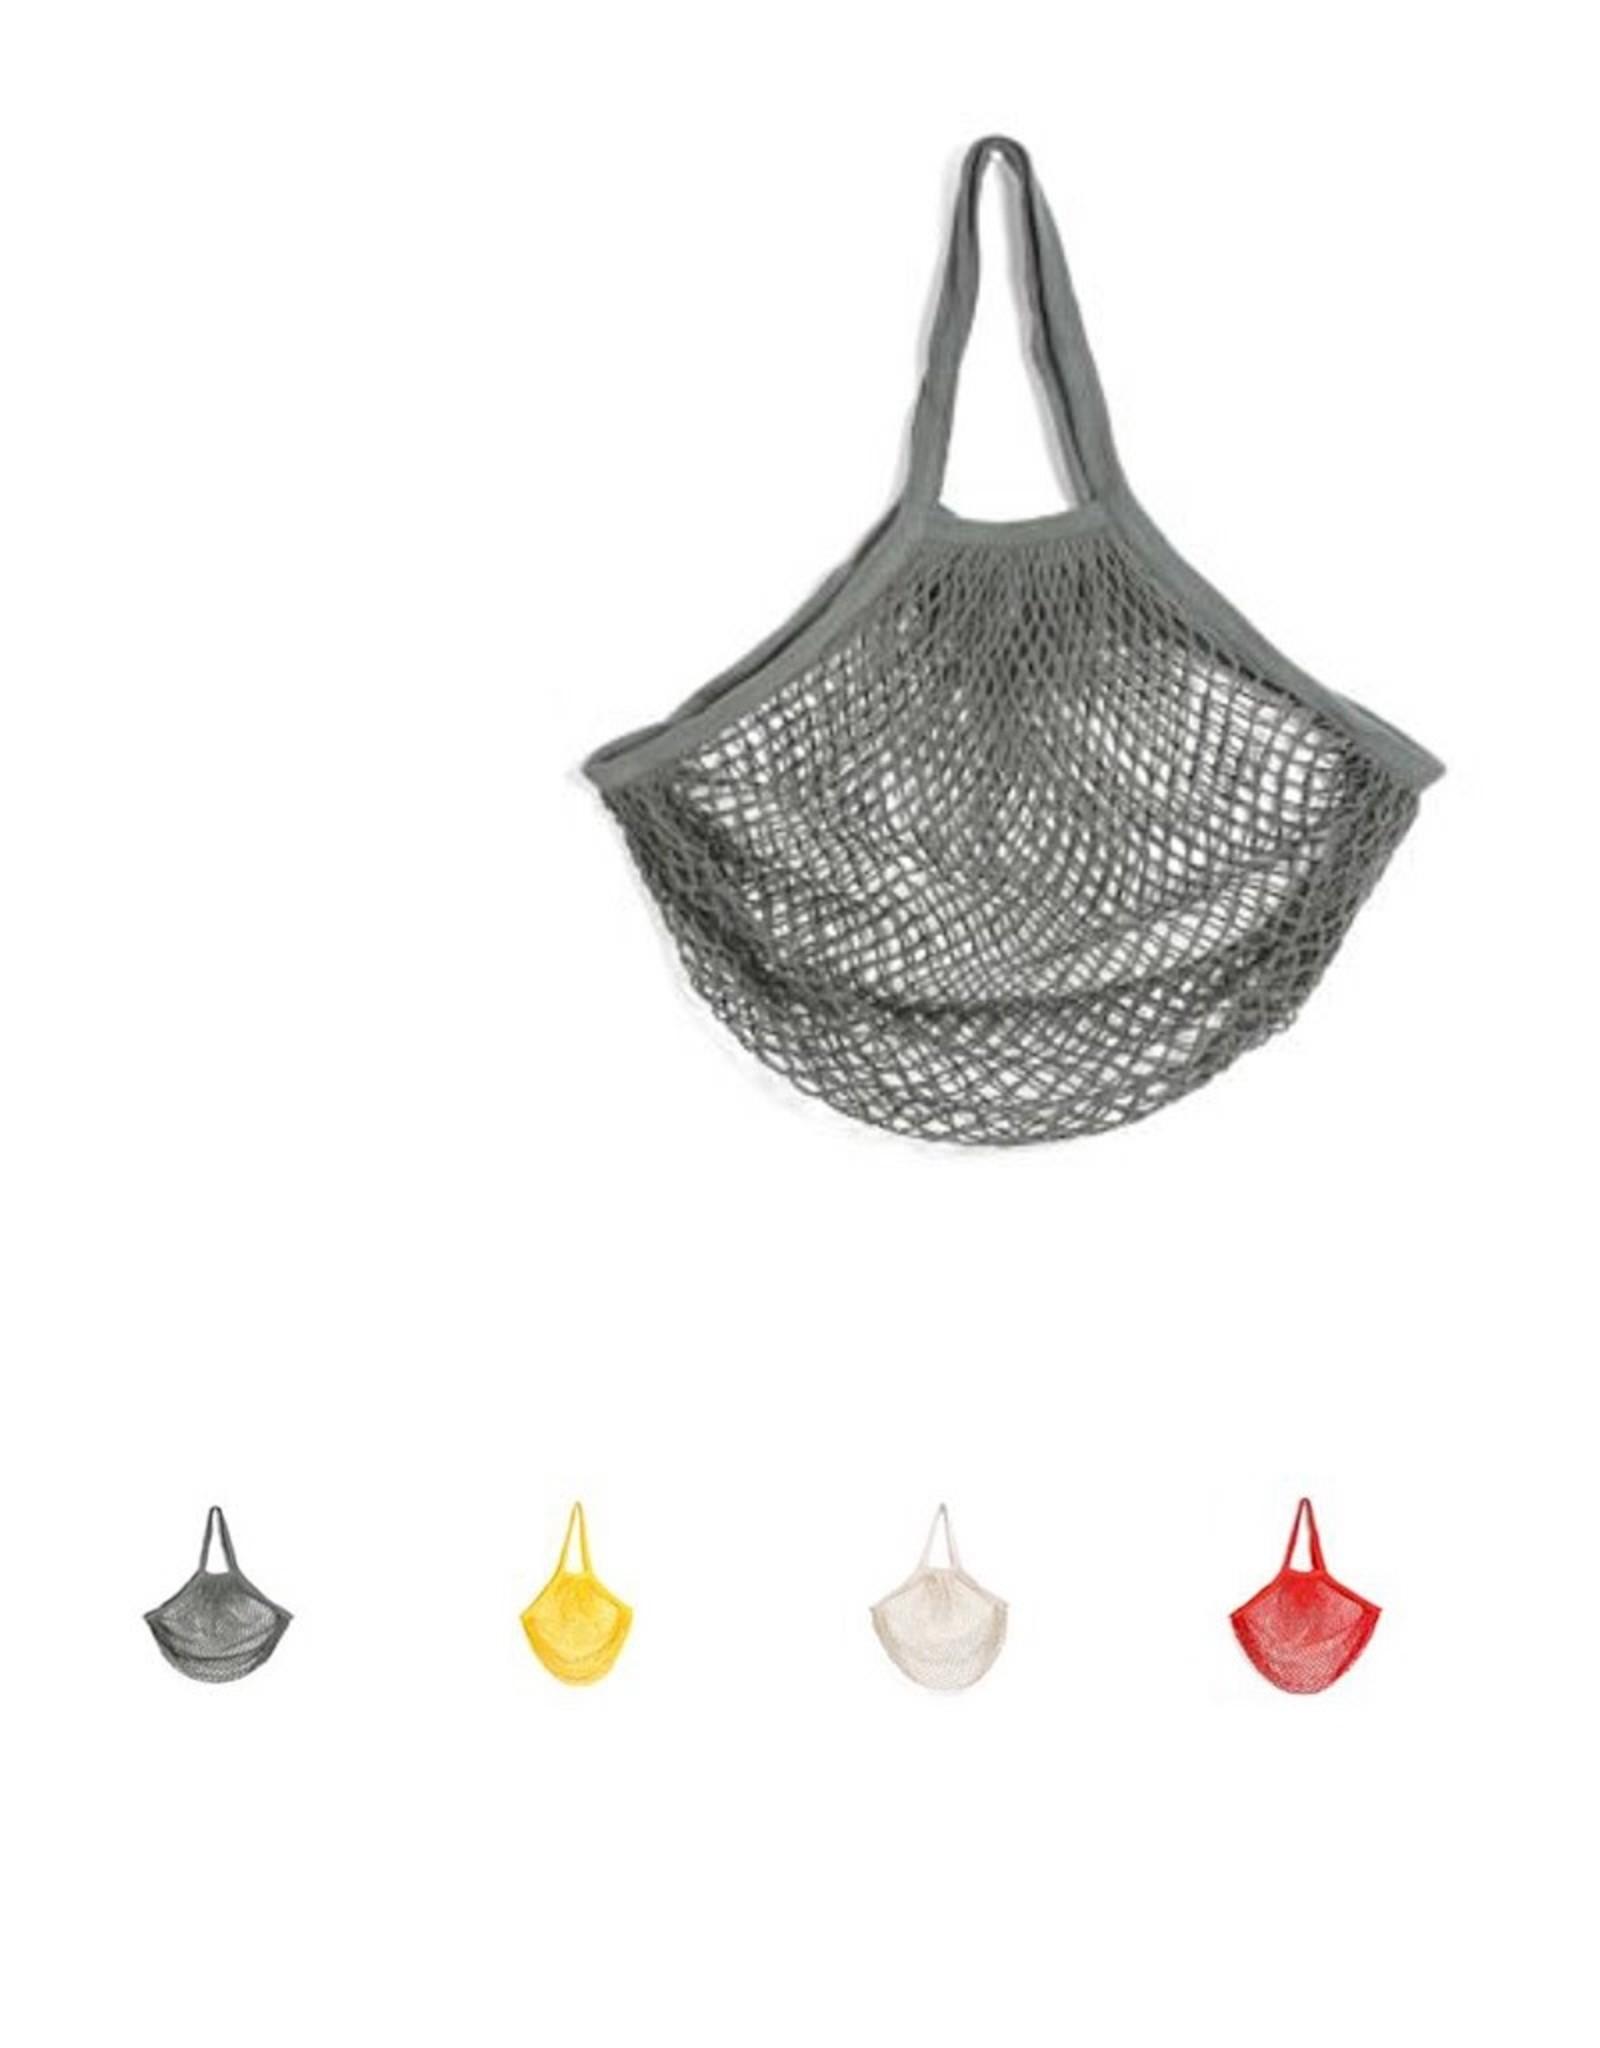 Kikkerland BB01-A Cotton Market Bag